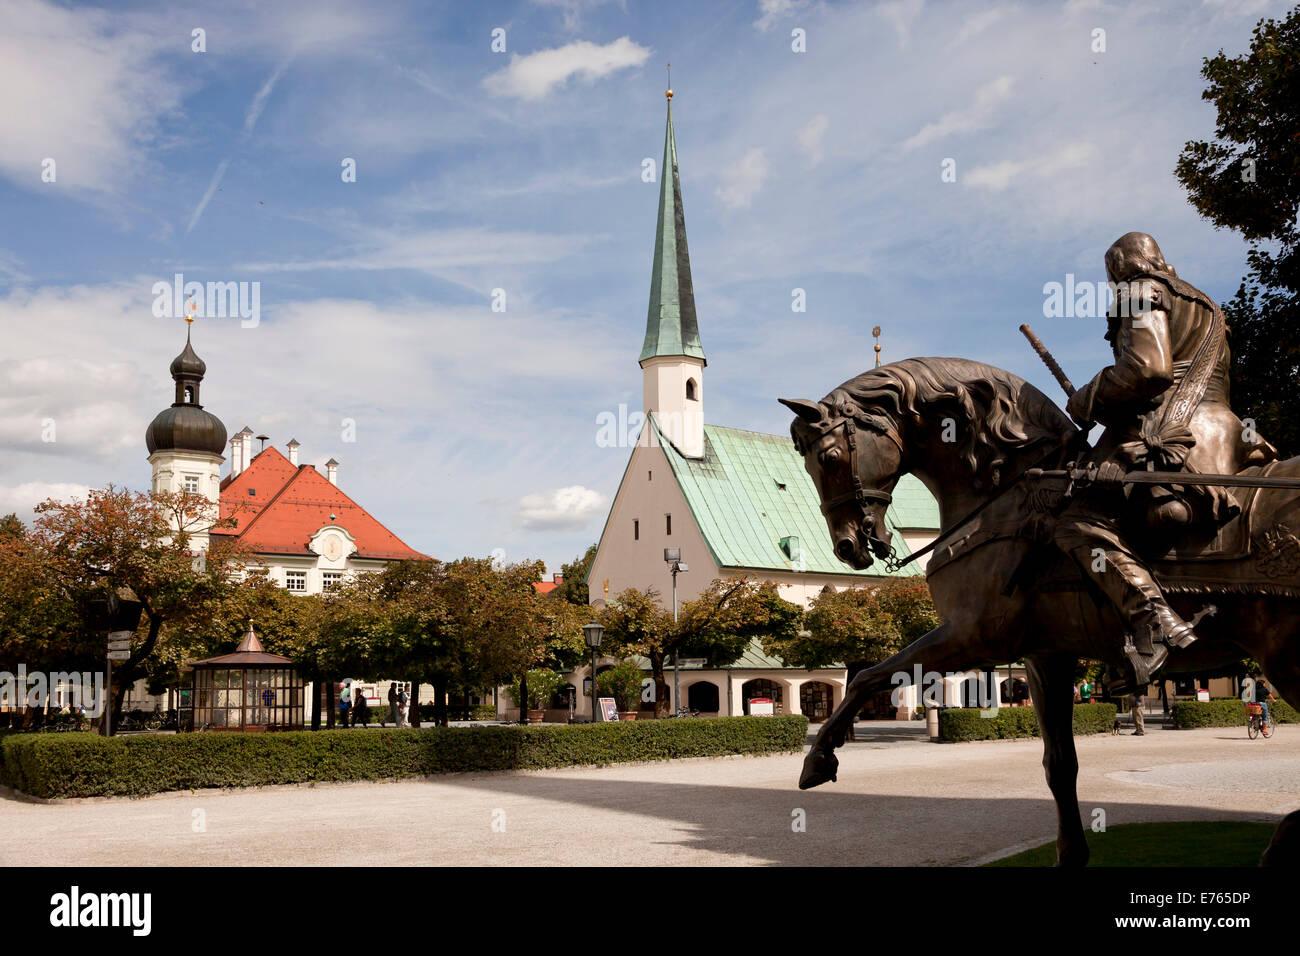 Feldmarschall-Tilly monument, the Chapel of Grace and Town Hall on Kapellplatz square in Altoetting, Upper-Bavaria, - Stock Image